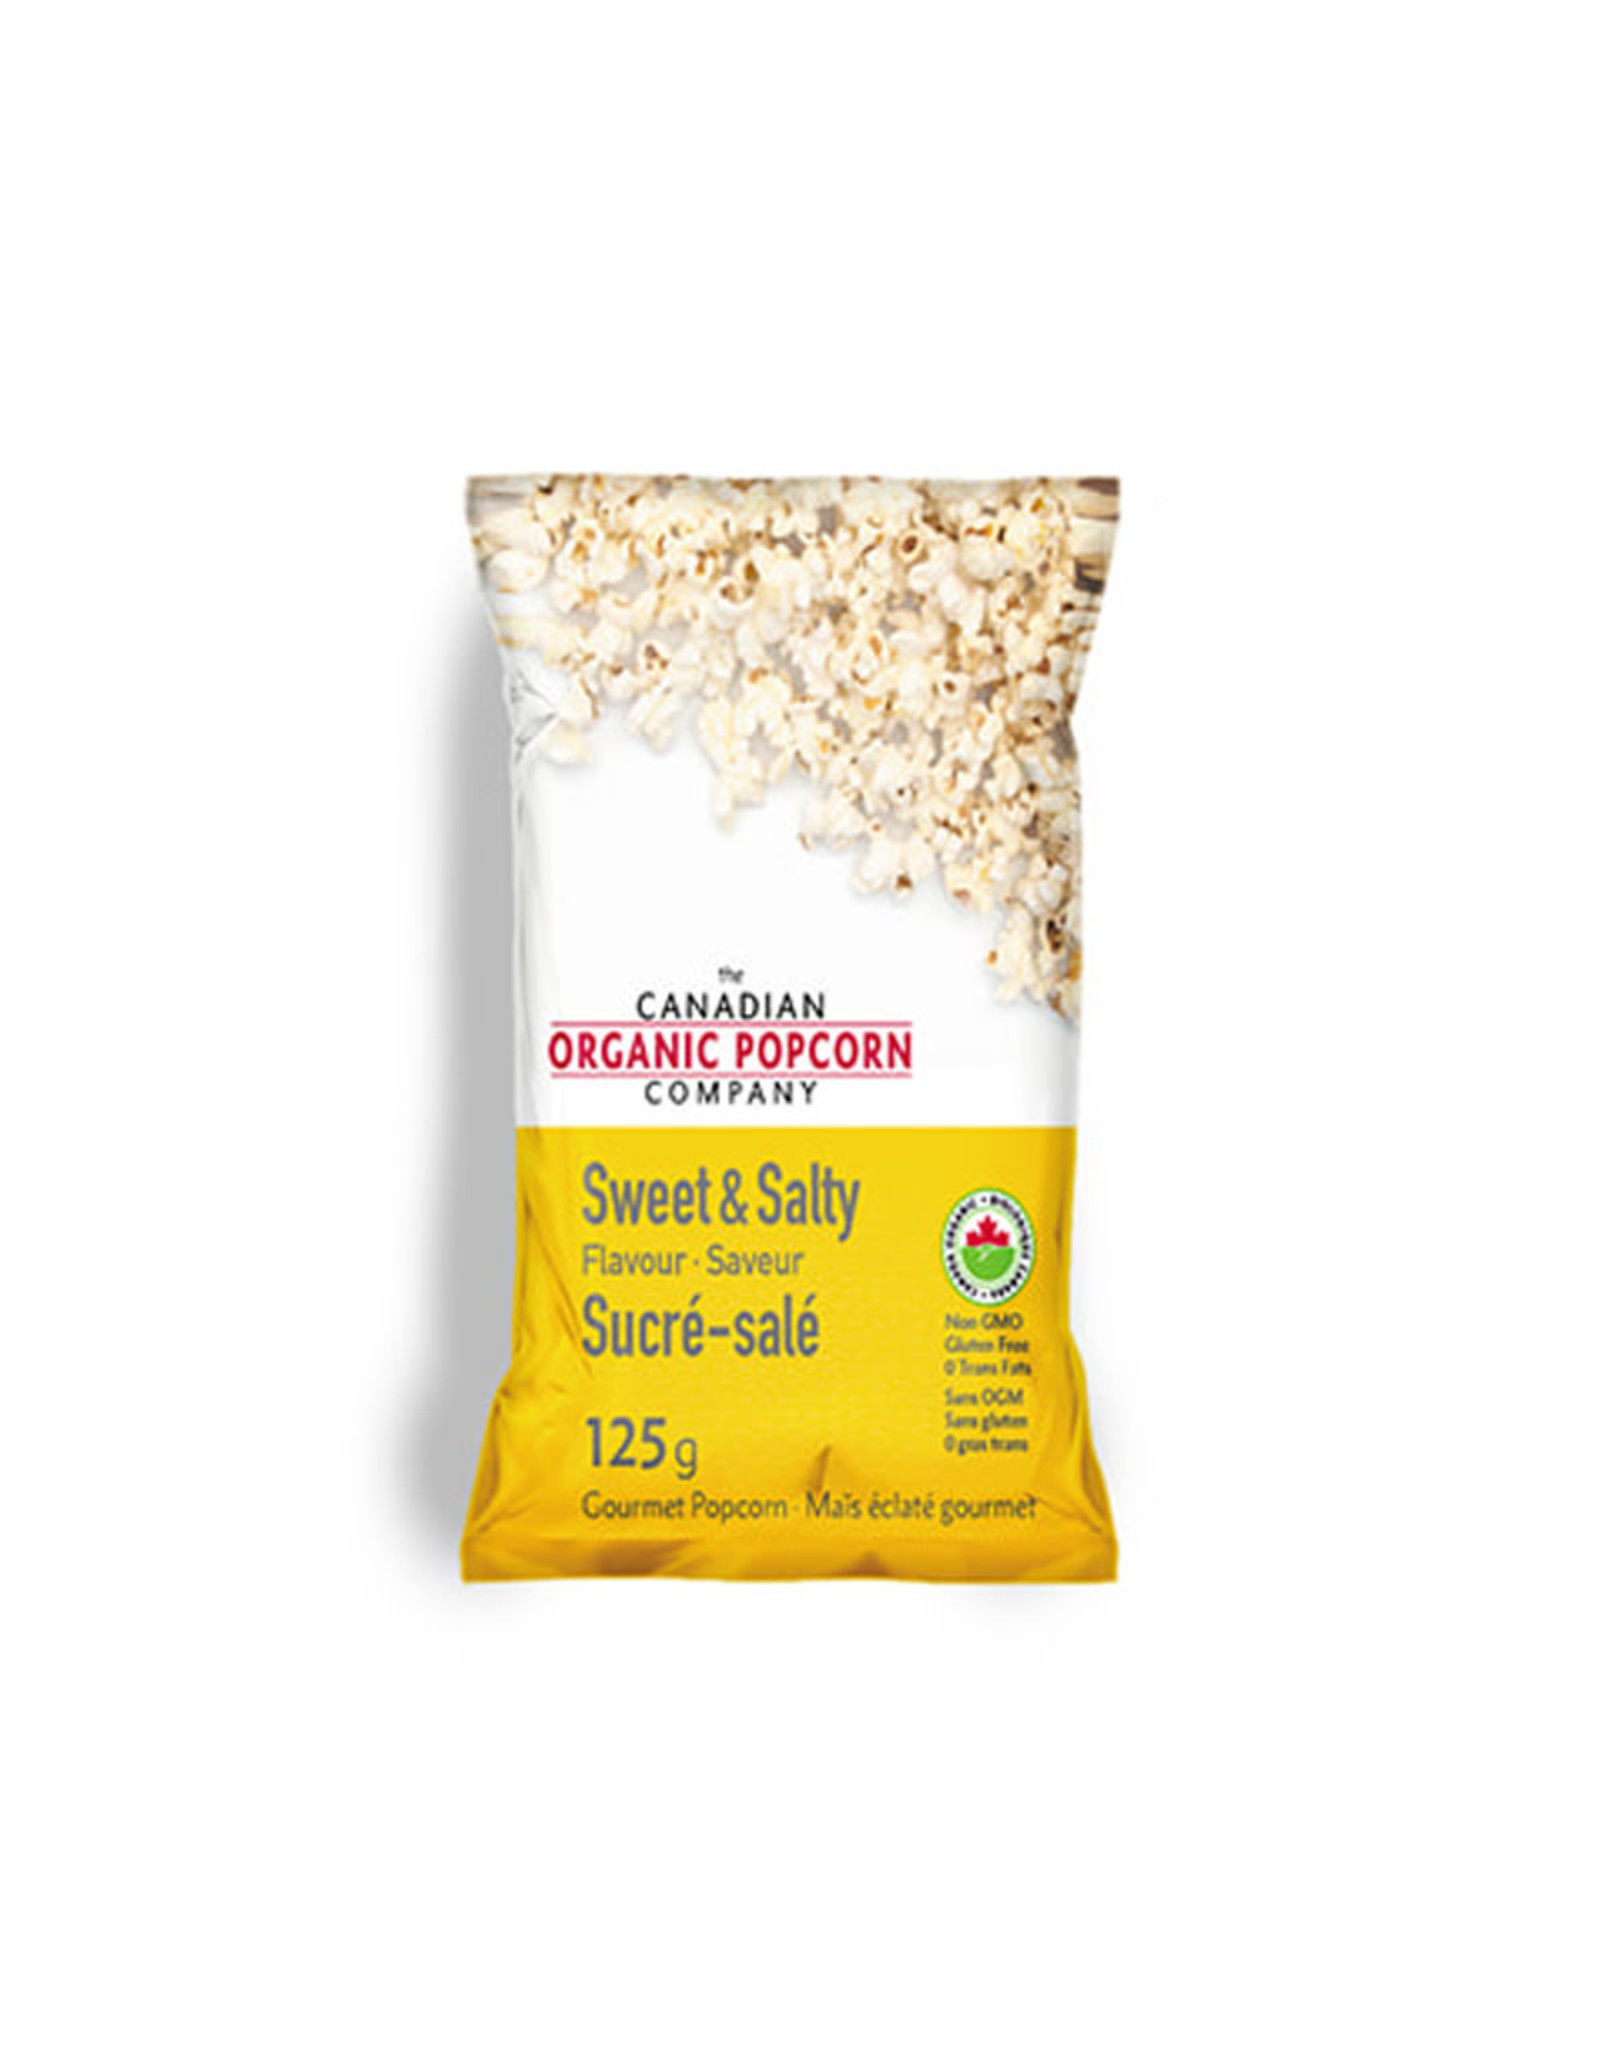 Canadian Organic Popcorn Canadian Organic Popcorn - Sweet & Salty (125g)